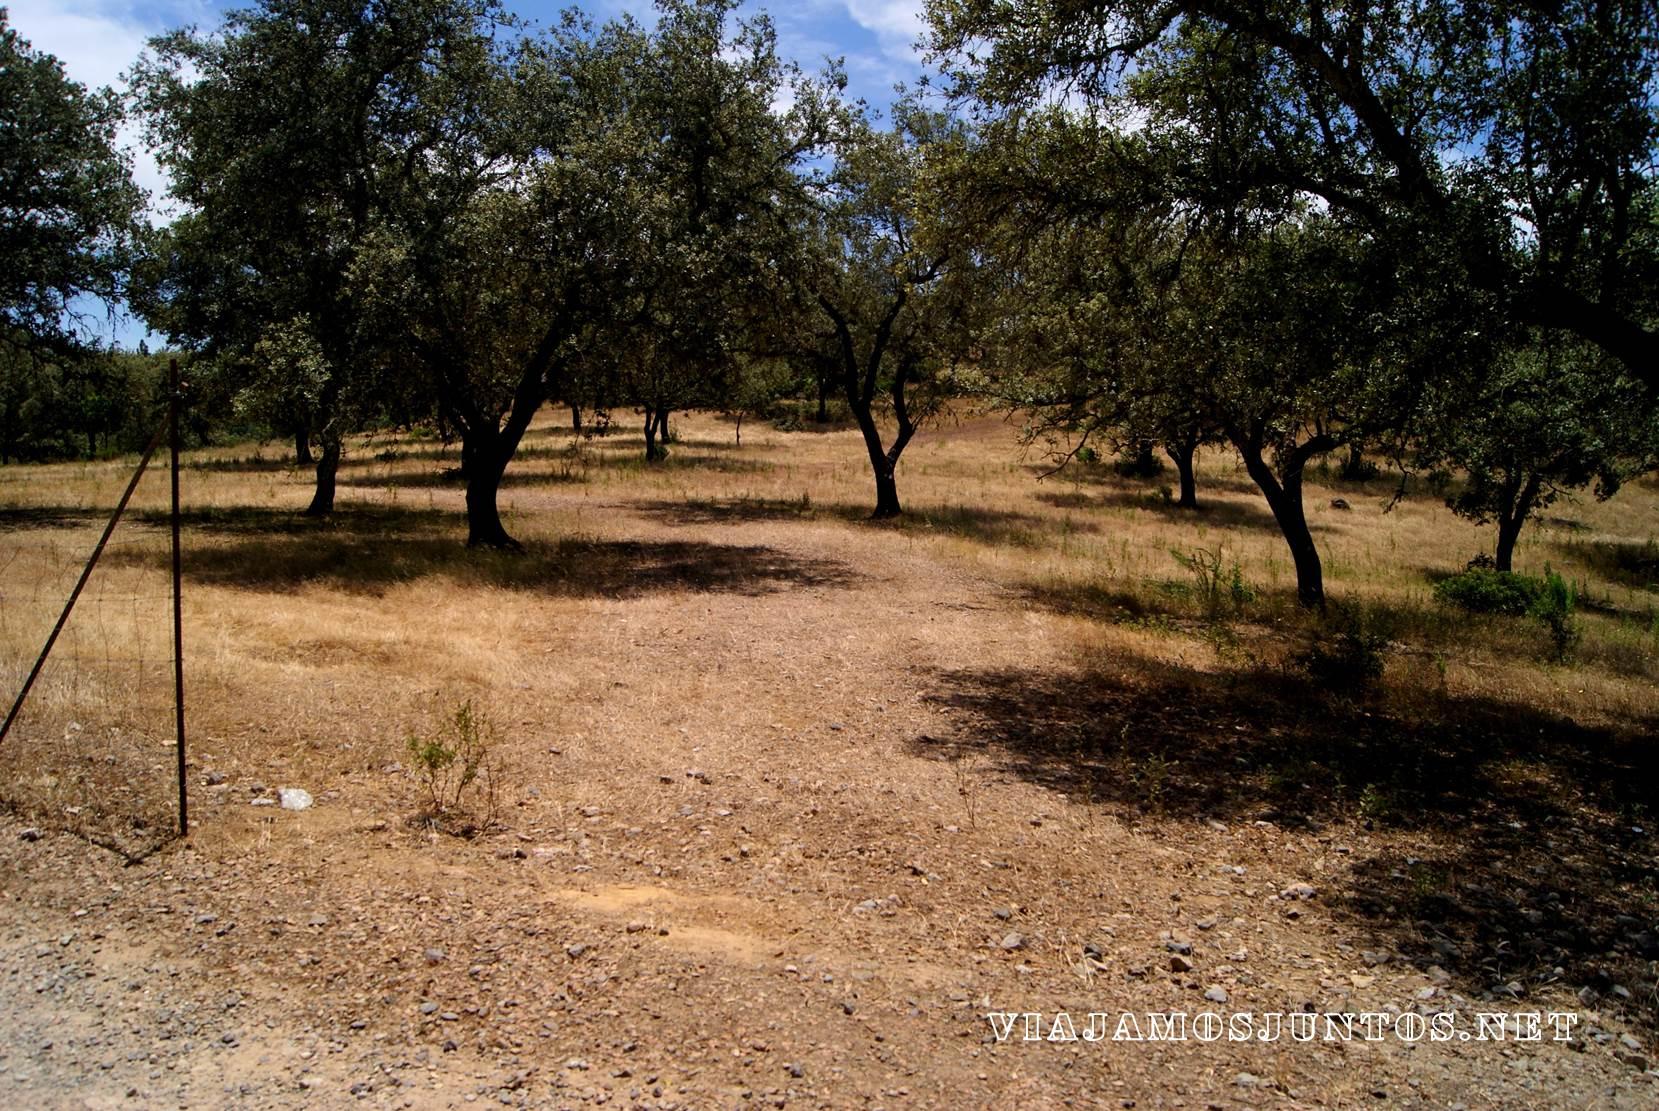 Huelva, dolmenes, ruta dolmenica, dolmenica, arqueologia, el pozuelo, descubrir, aventura, viajar por libre, andalucia